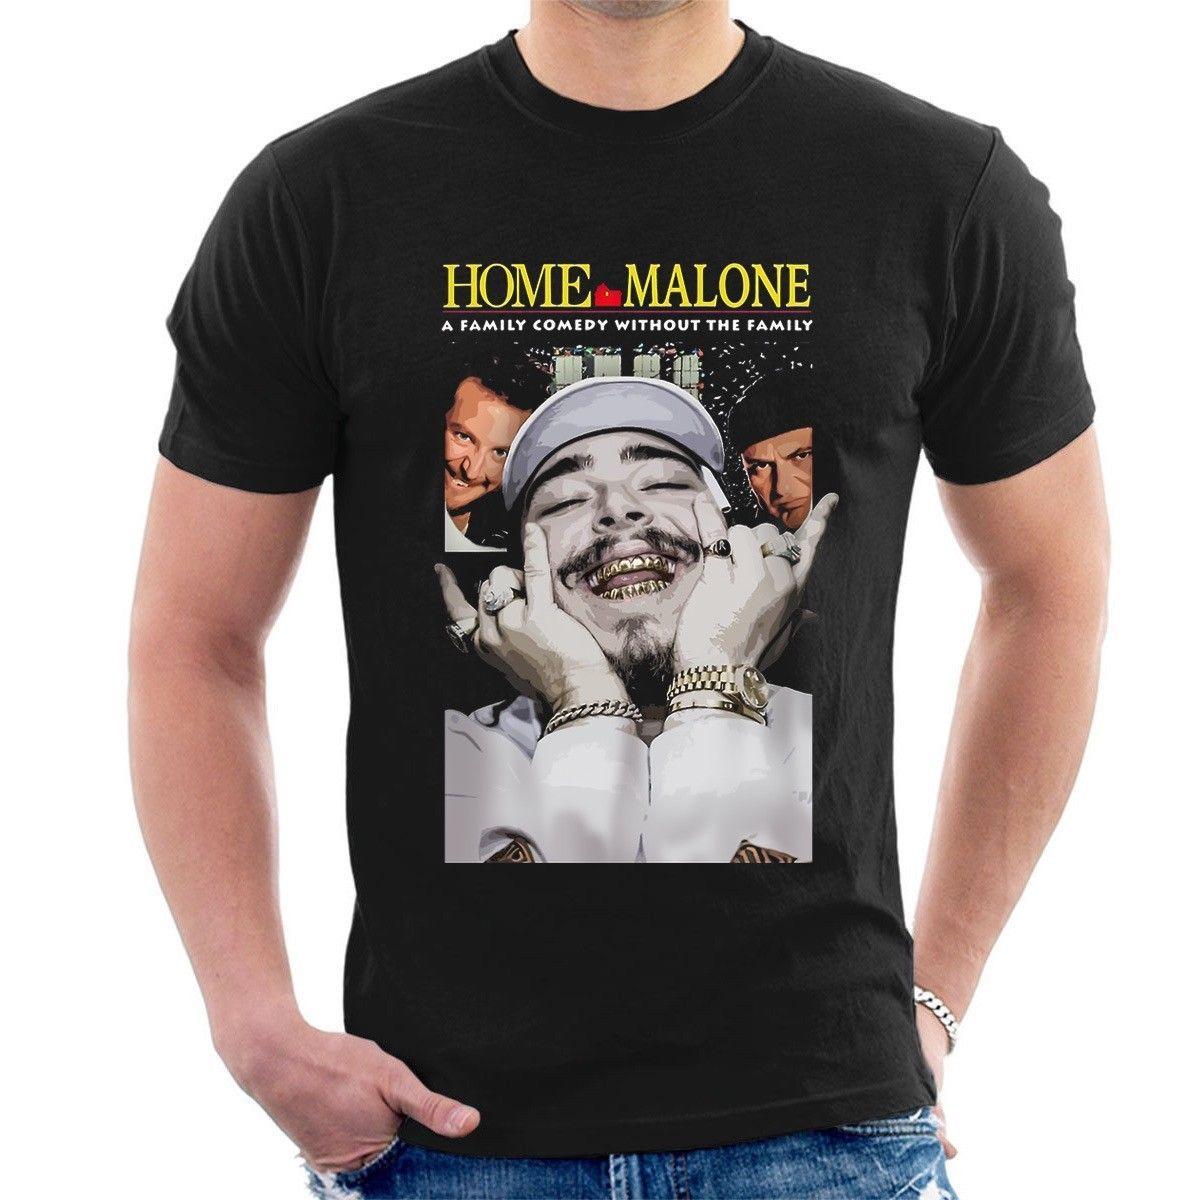 Home Malone T Shirt Post Malone Spoof Home Alone Funny Parody Rockstar  Teecool Casual Pride T Shirt Men Unisex Fashion Tshirt Cool Tee Shirts  Designs Web T ... e0aa69d9b